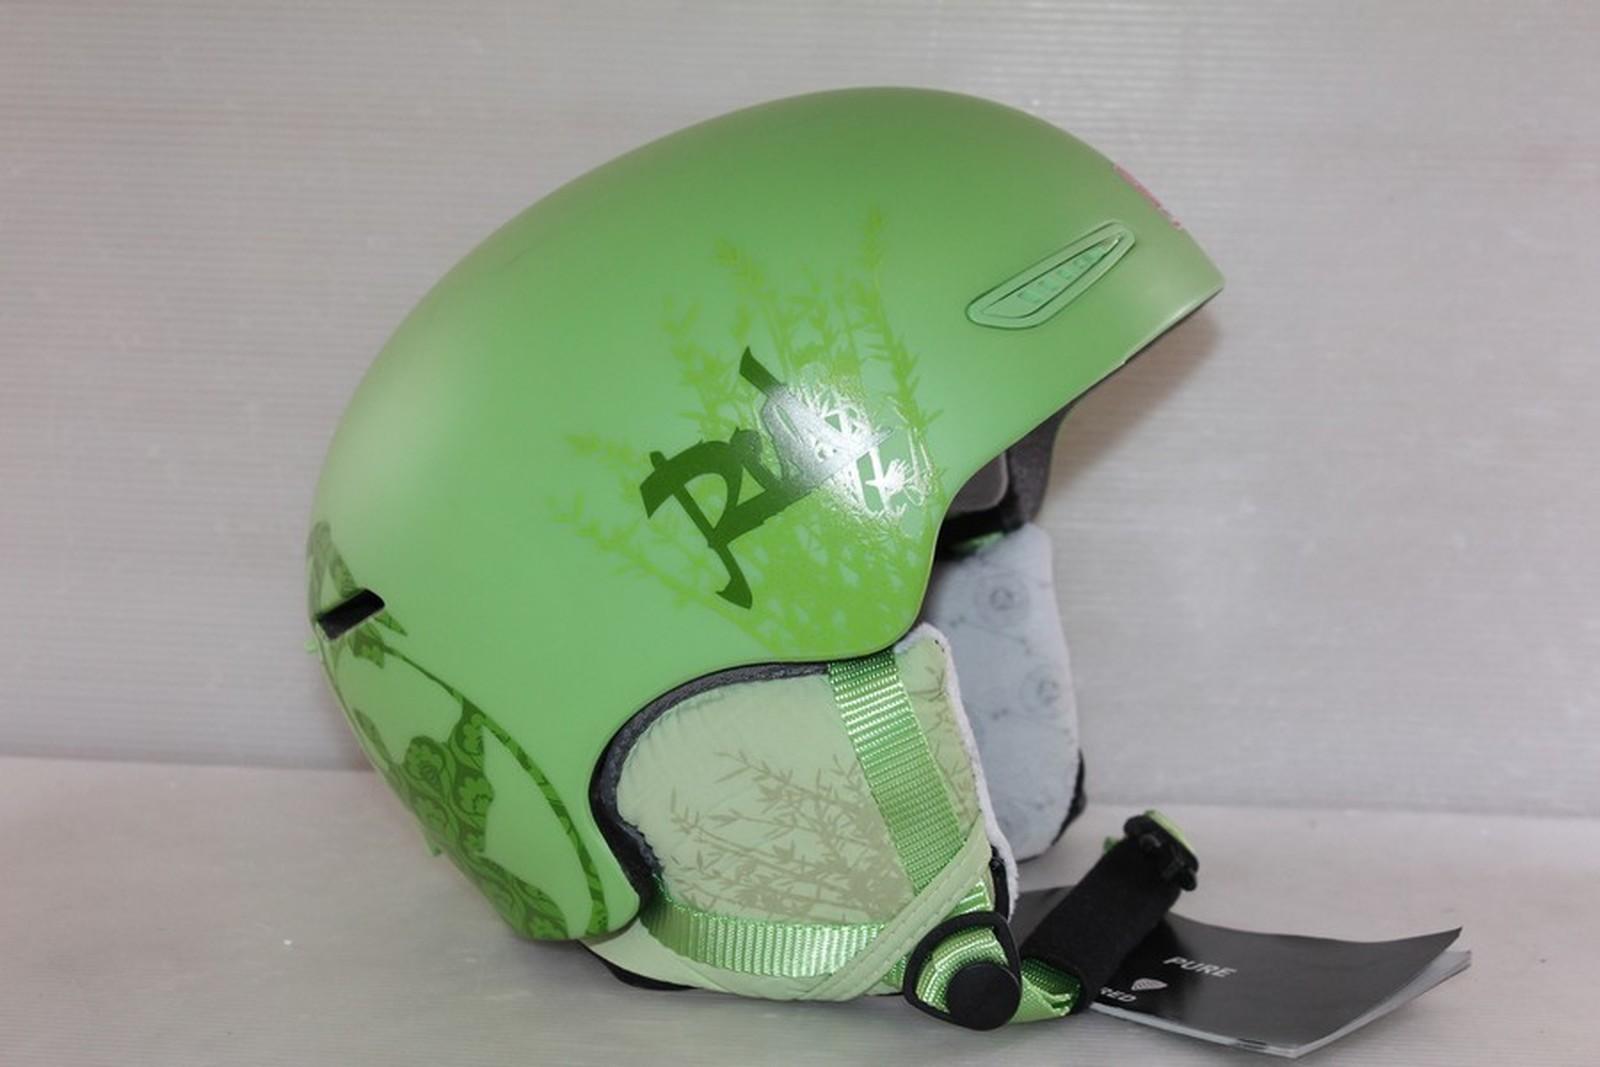 Dámská lyžařská helma RED Pure - posuvná vel. 59 - 61